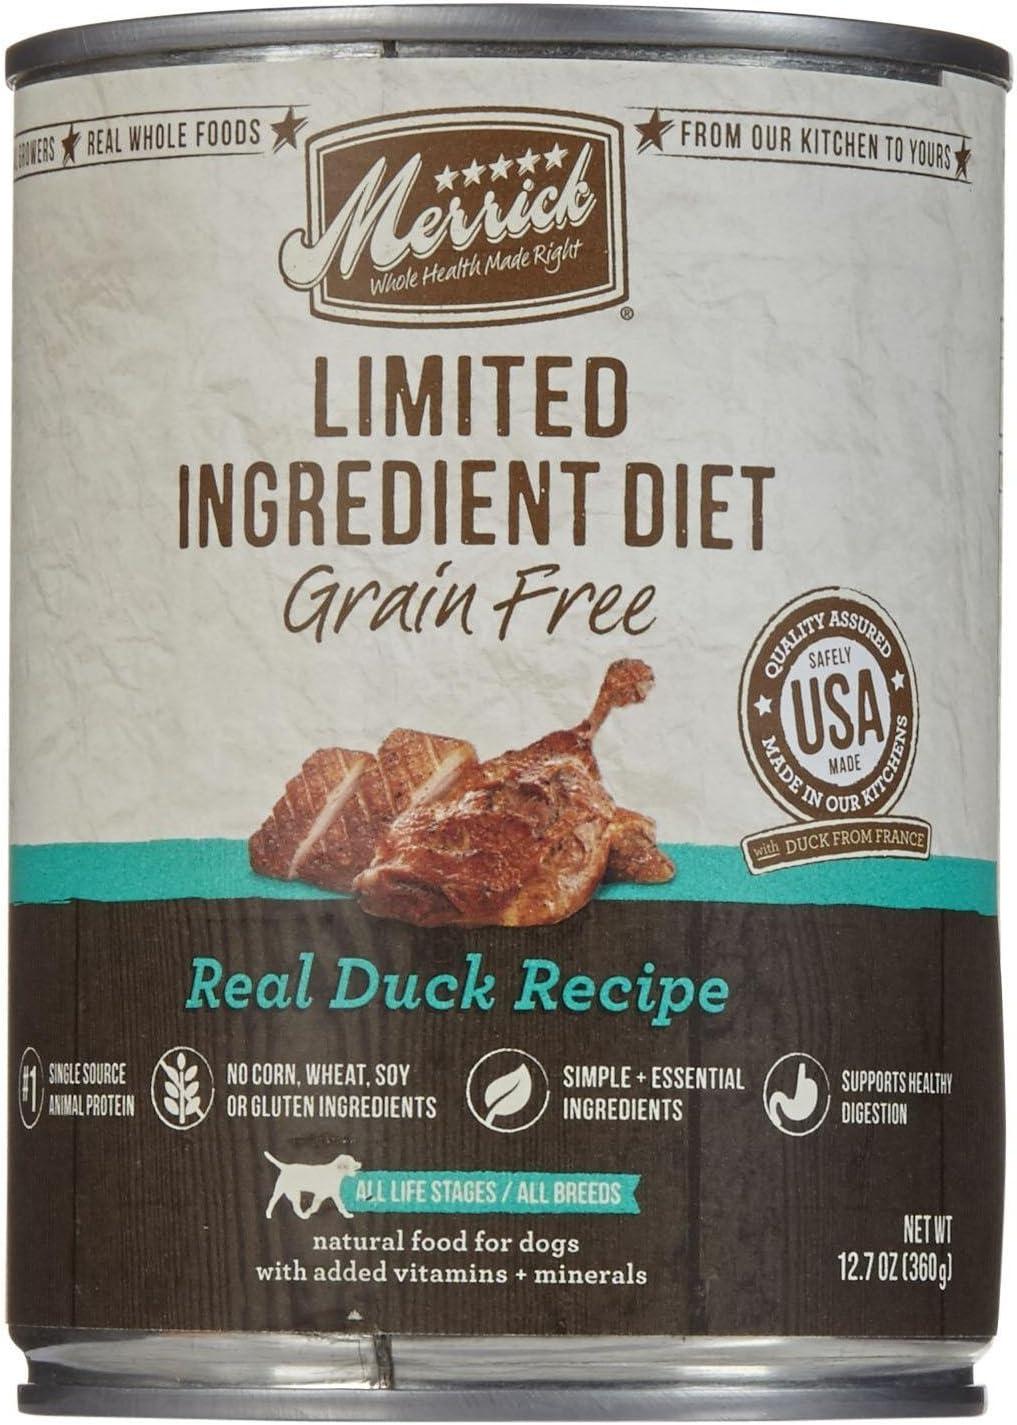 Merrick Limited Ingredient Diet - Real Duck Recipe - 12.7 Oz - 12 Ct